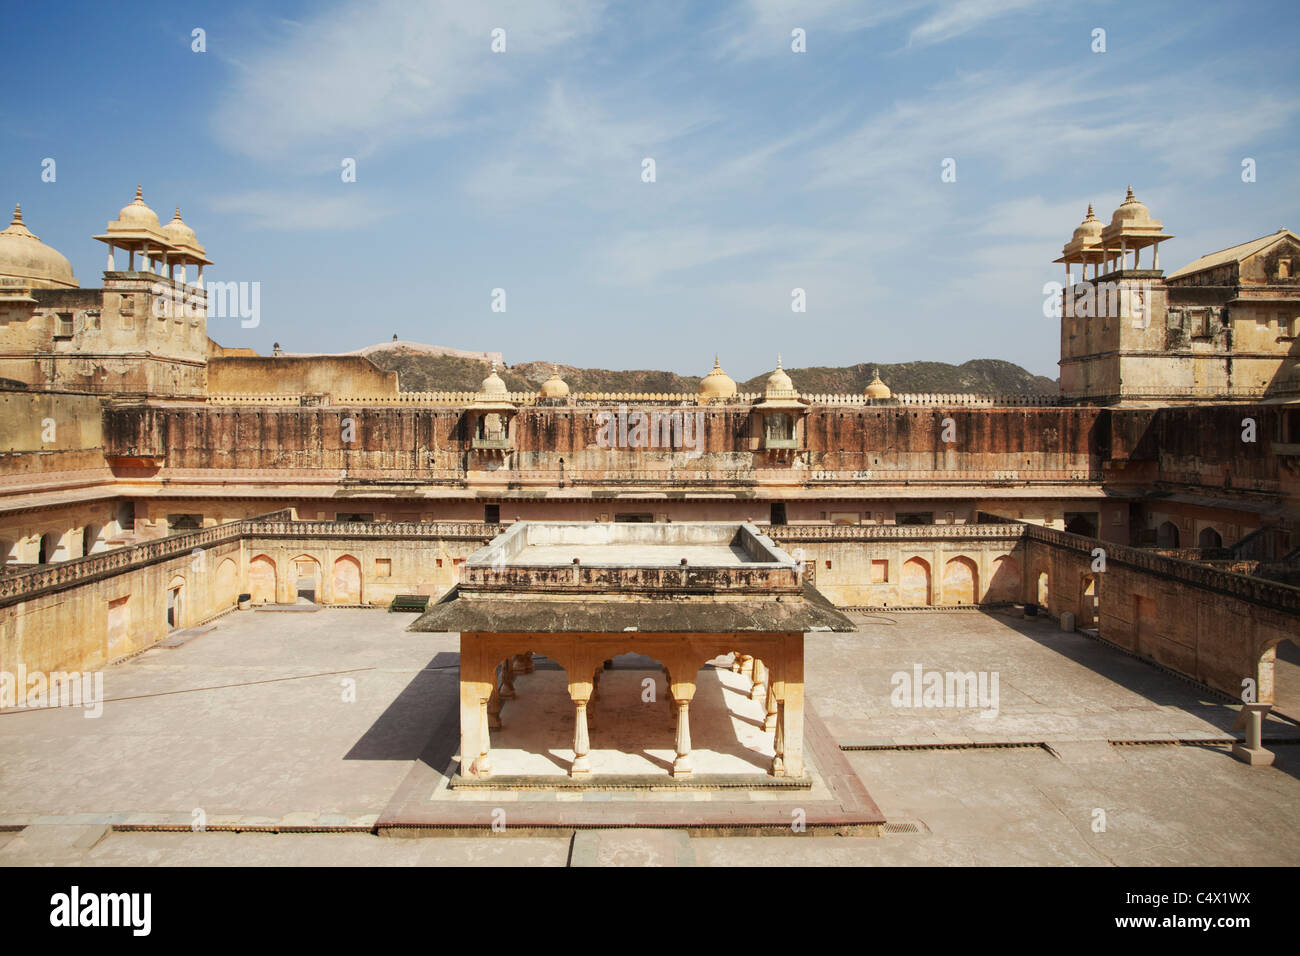 Cour de palais de Man Singh I, Fort Amber, Jaipur, Rajasthan, Inde Photo Stock